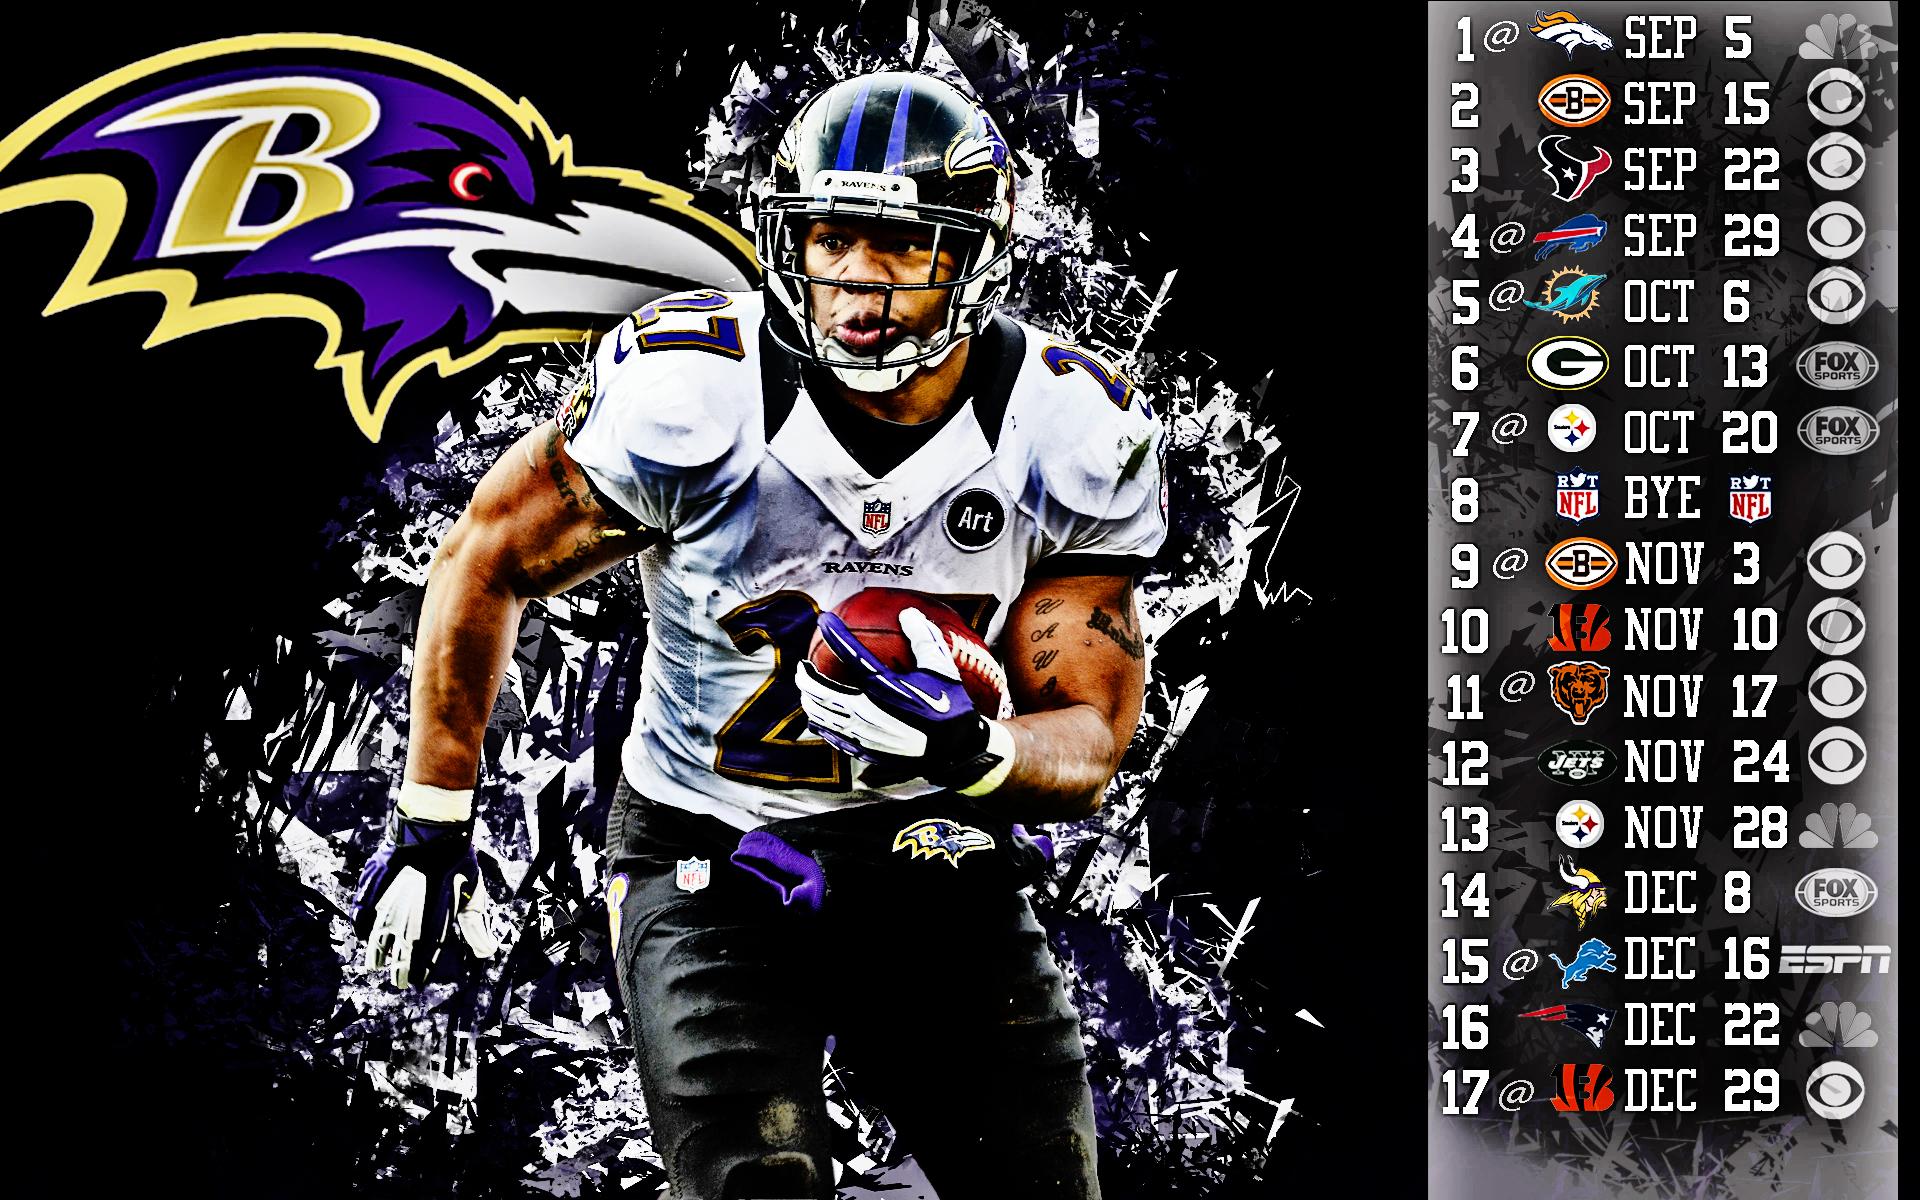 2013 Baltimore Ravens football nfl wallpaper 1920x1200 130396 1920x1200